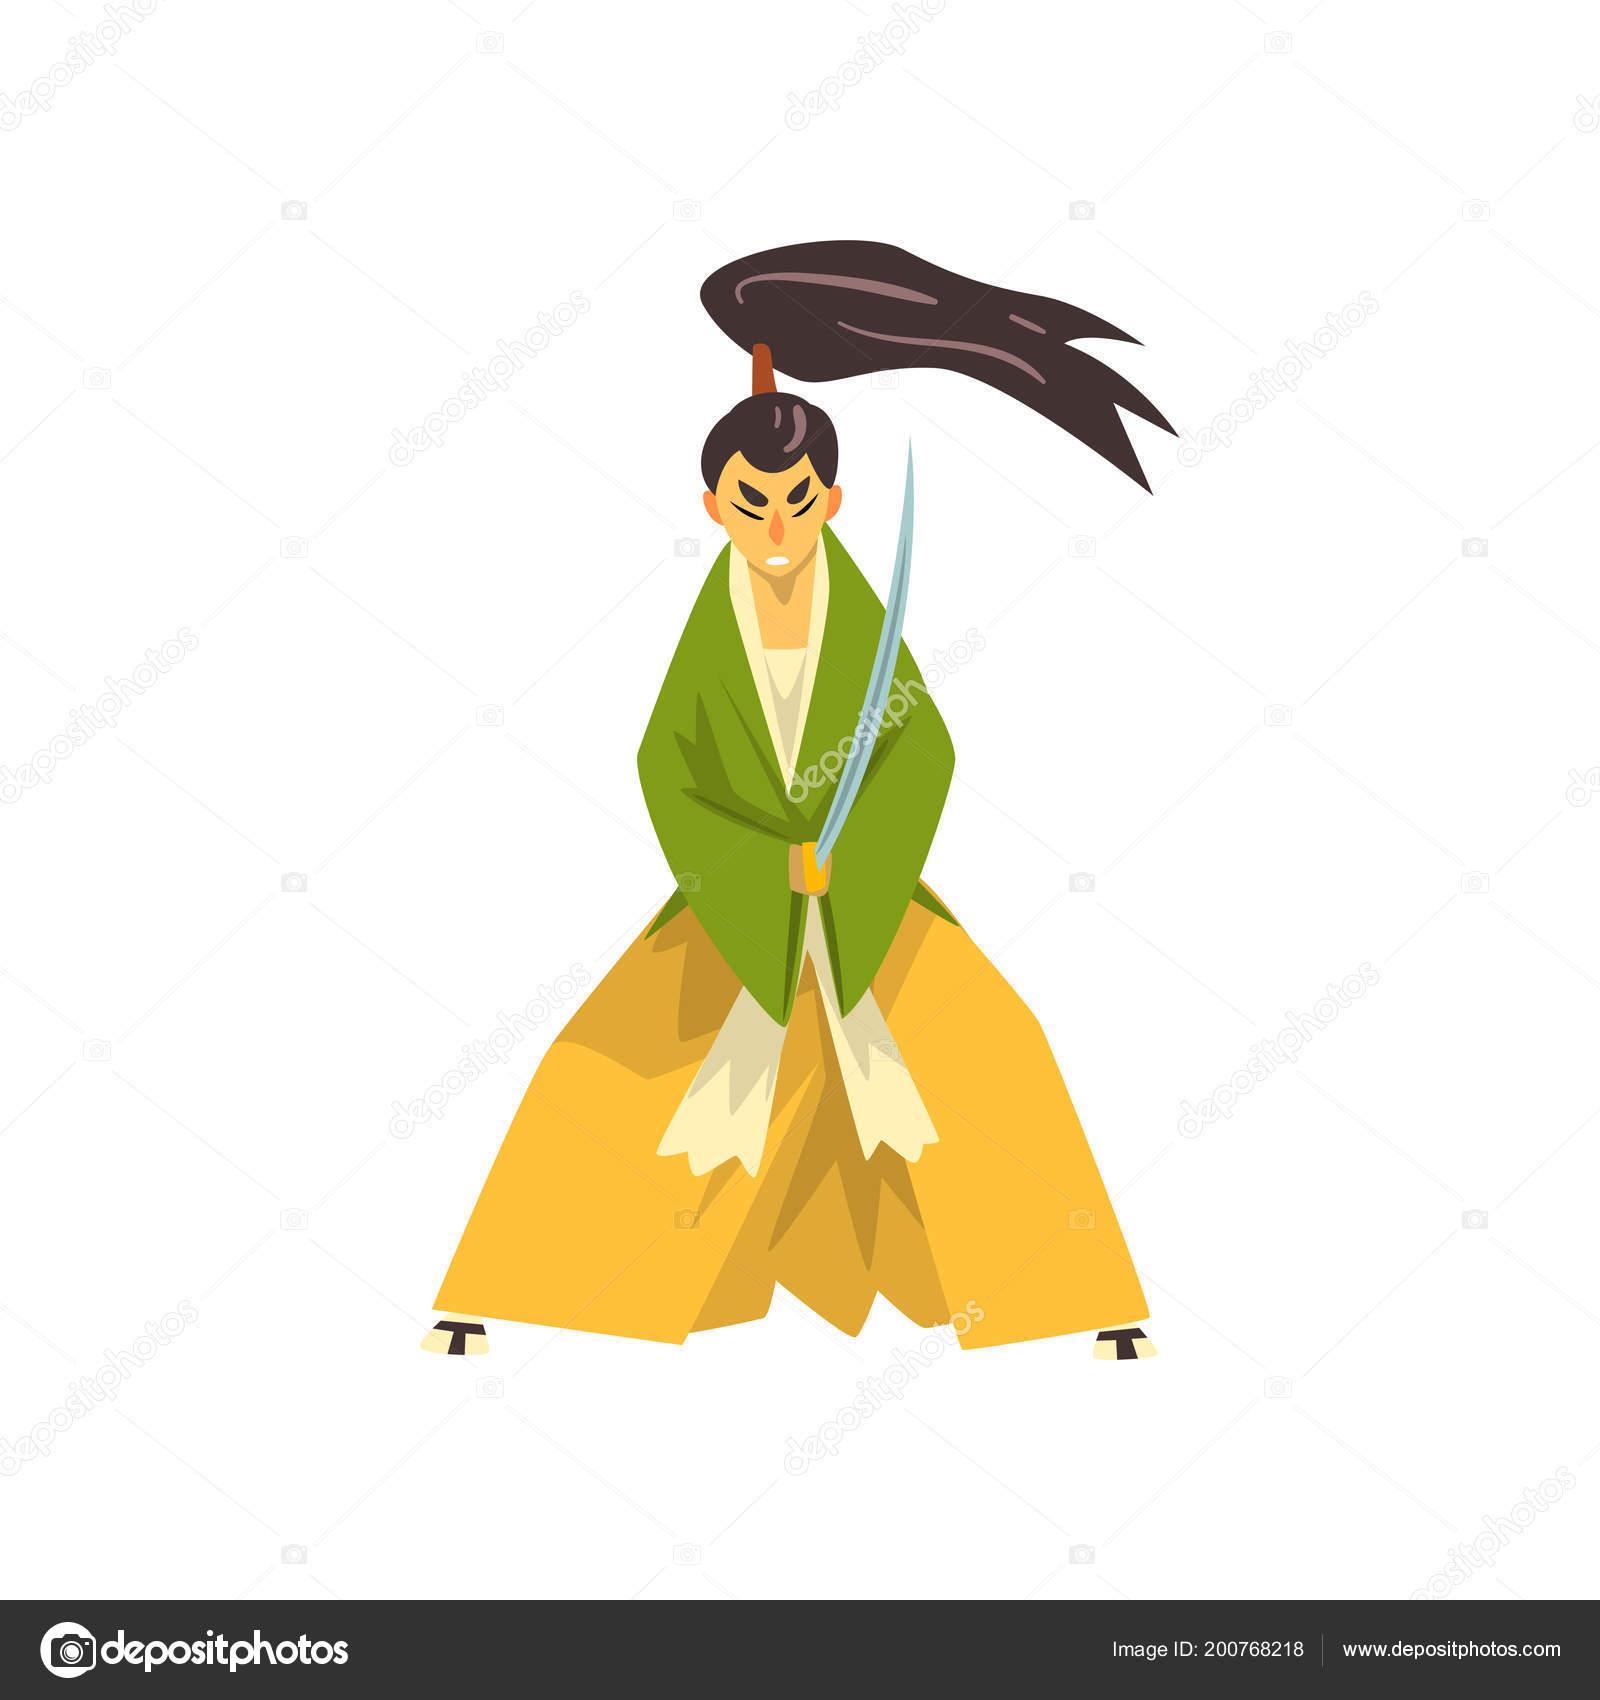 Samourai Dessin Anime Personnage Avec Katana Epee Guerrier Japonais